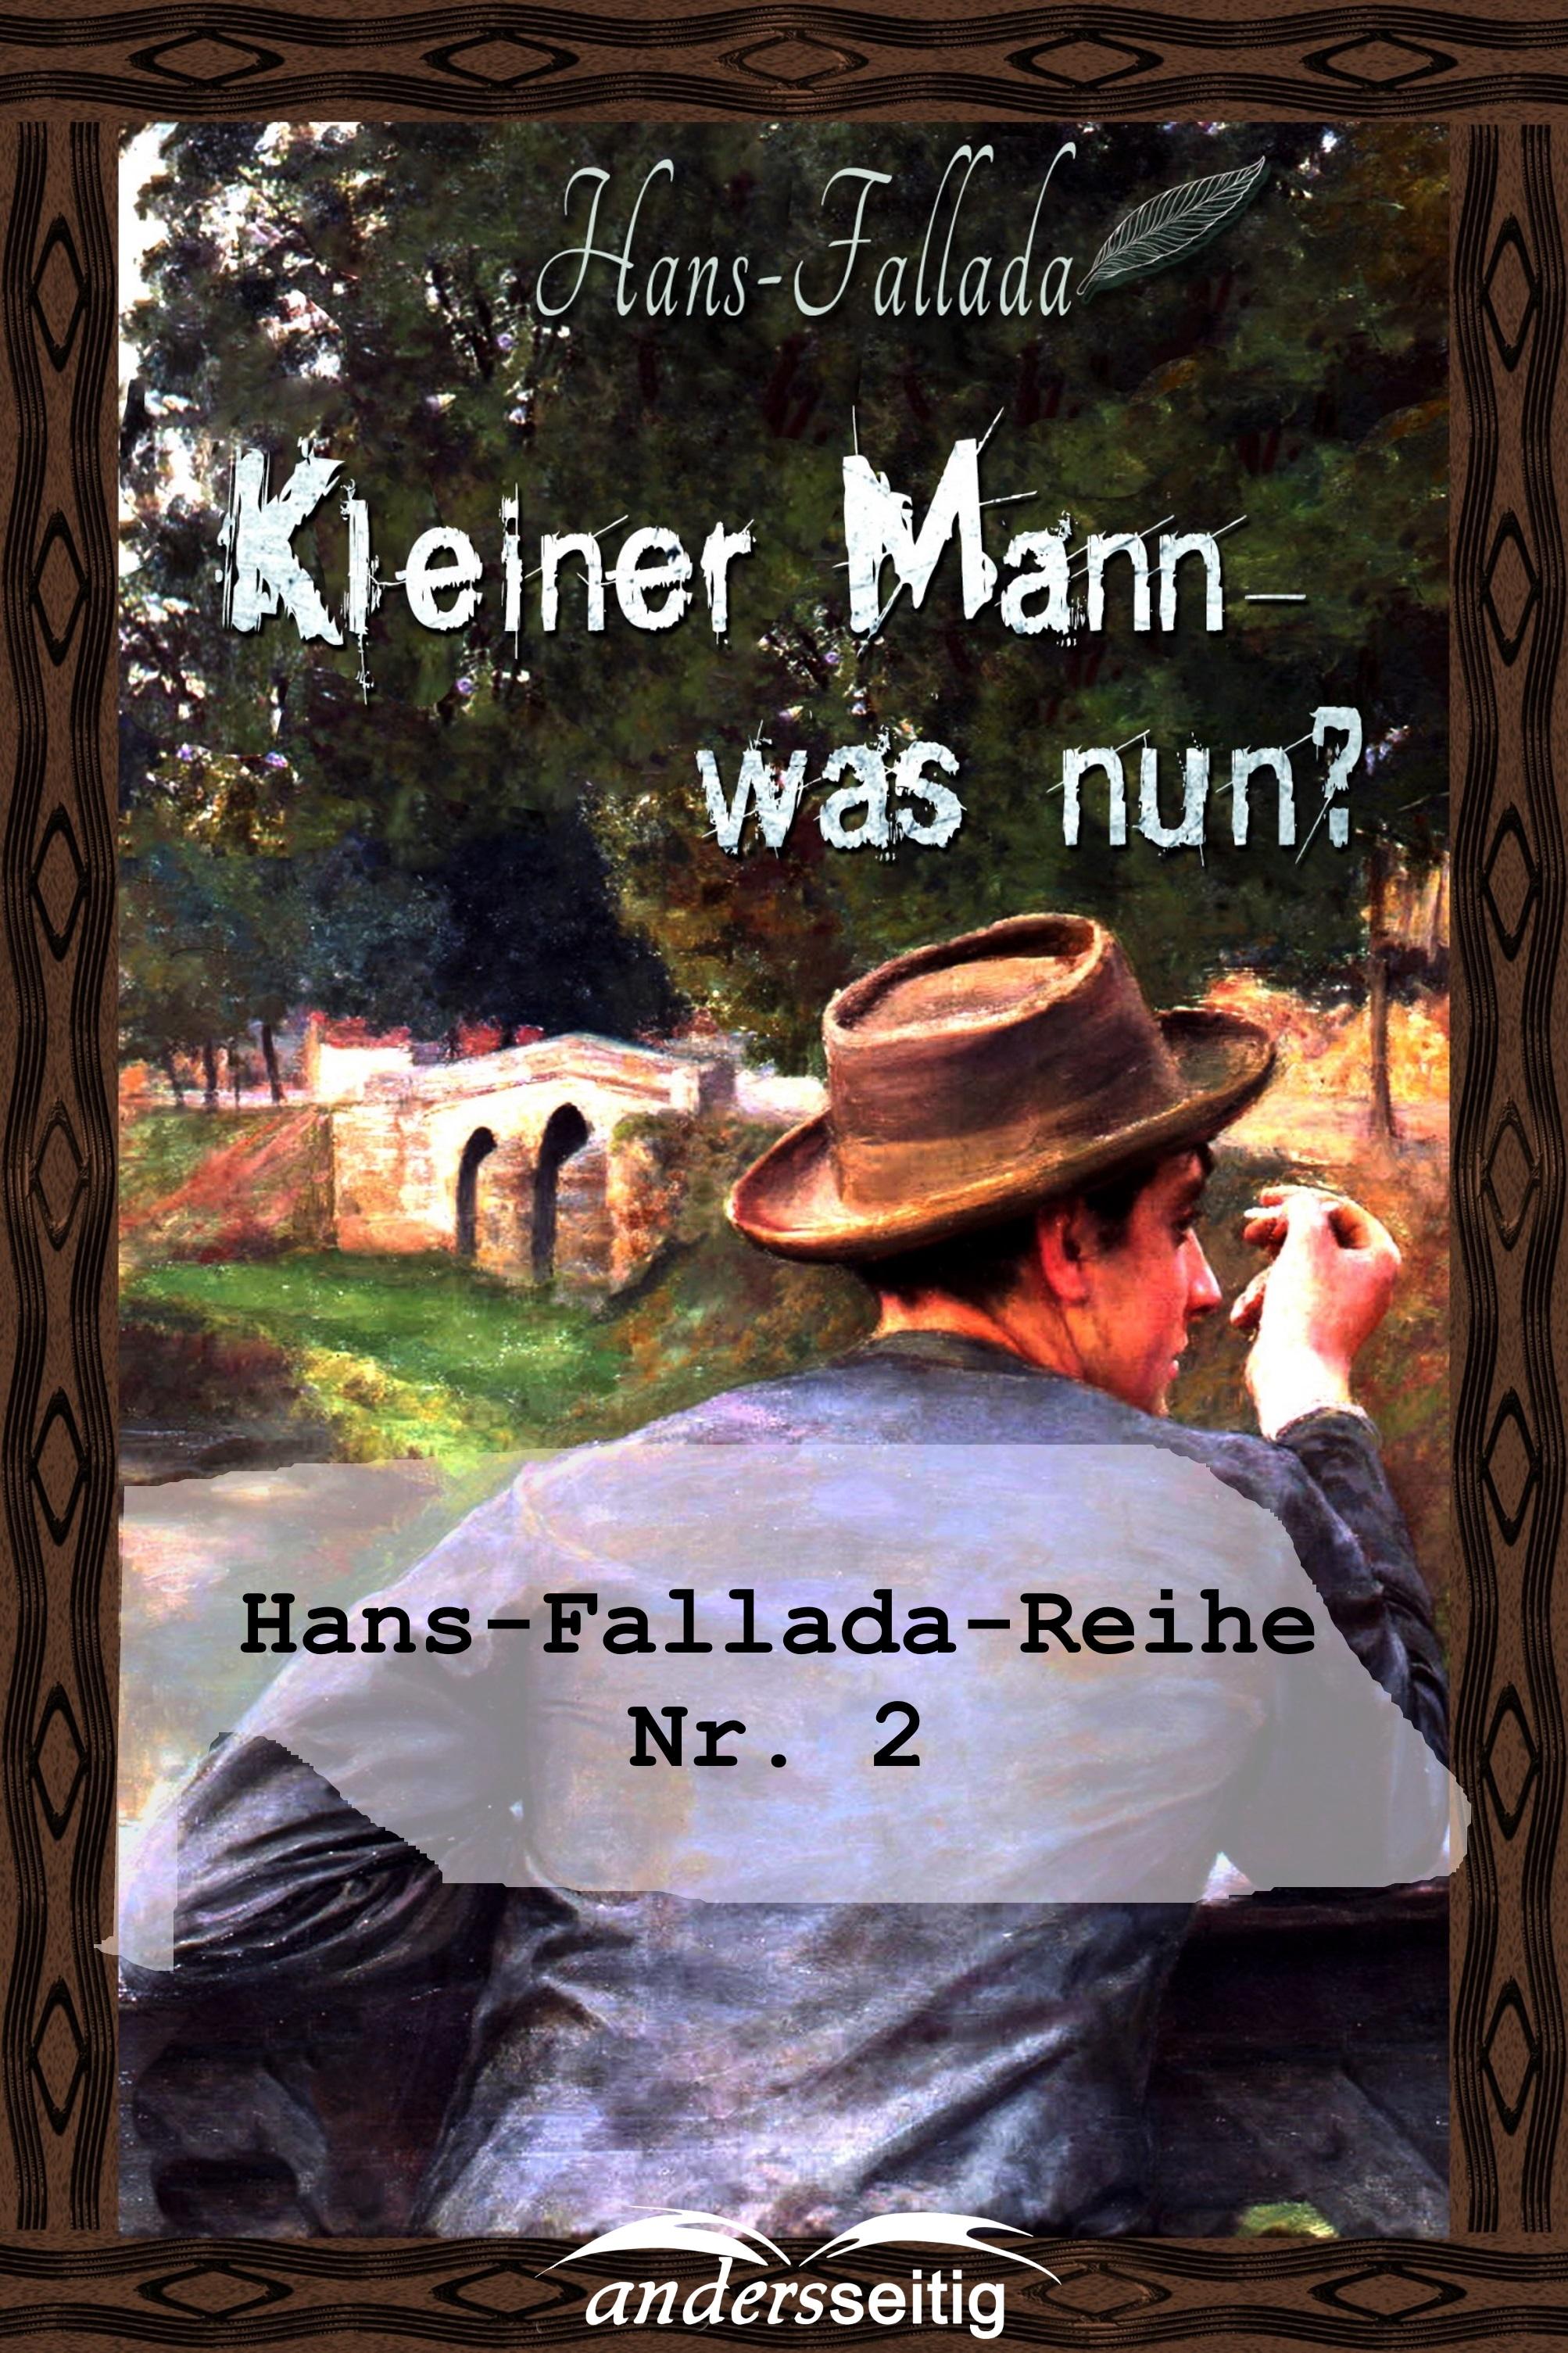 Фото - Ханс Фаллада Kleiner Mann - was nun? клюхе ханс франция